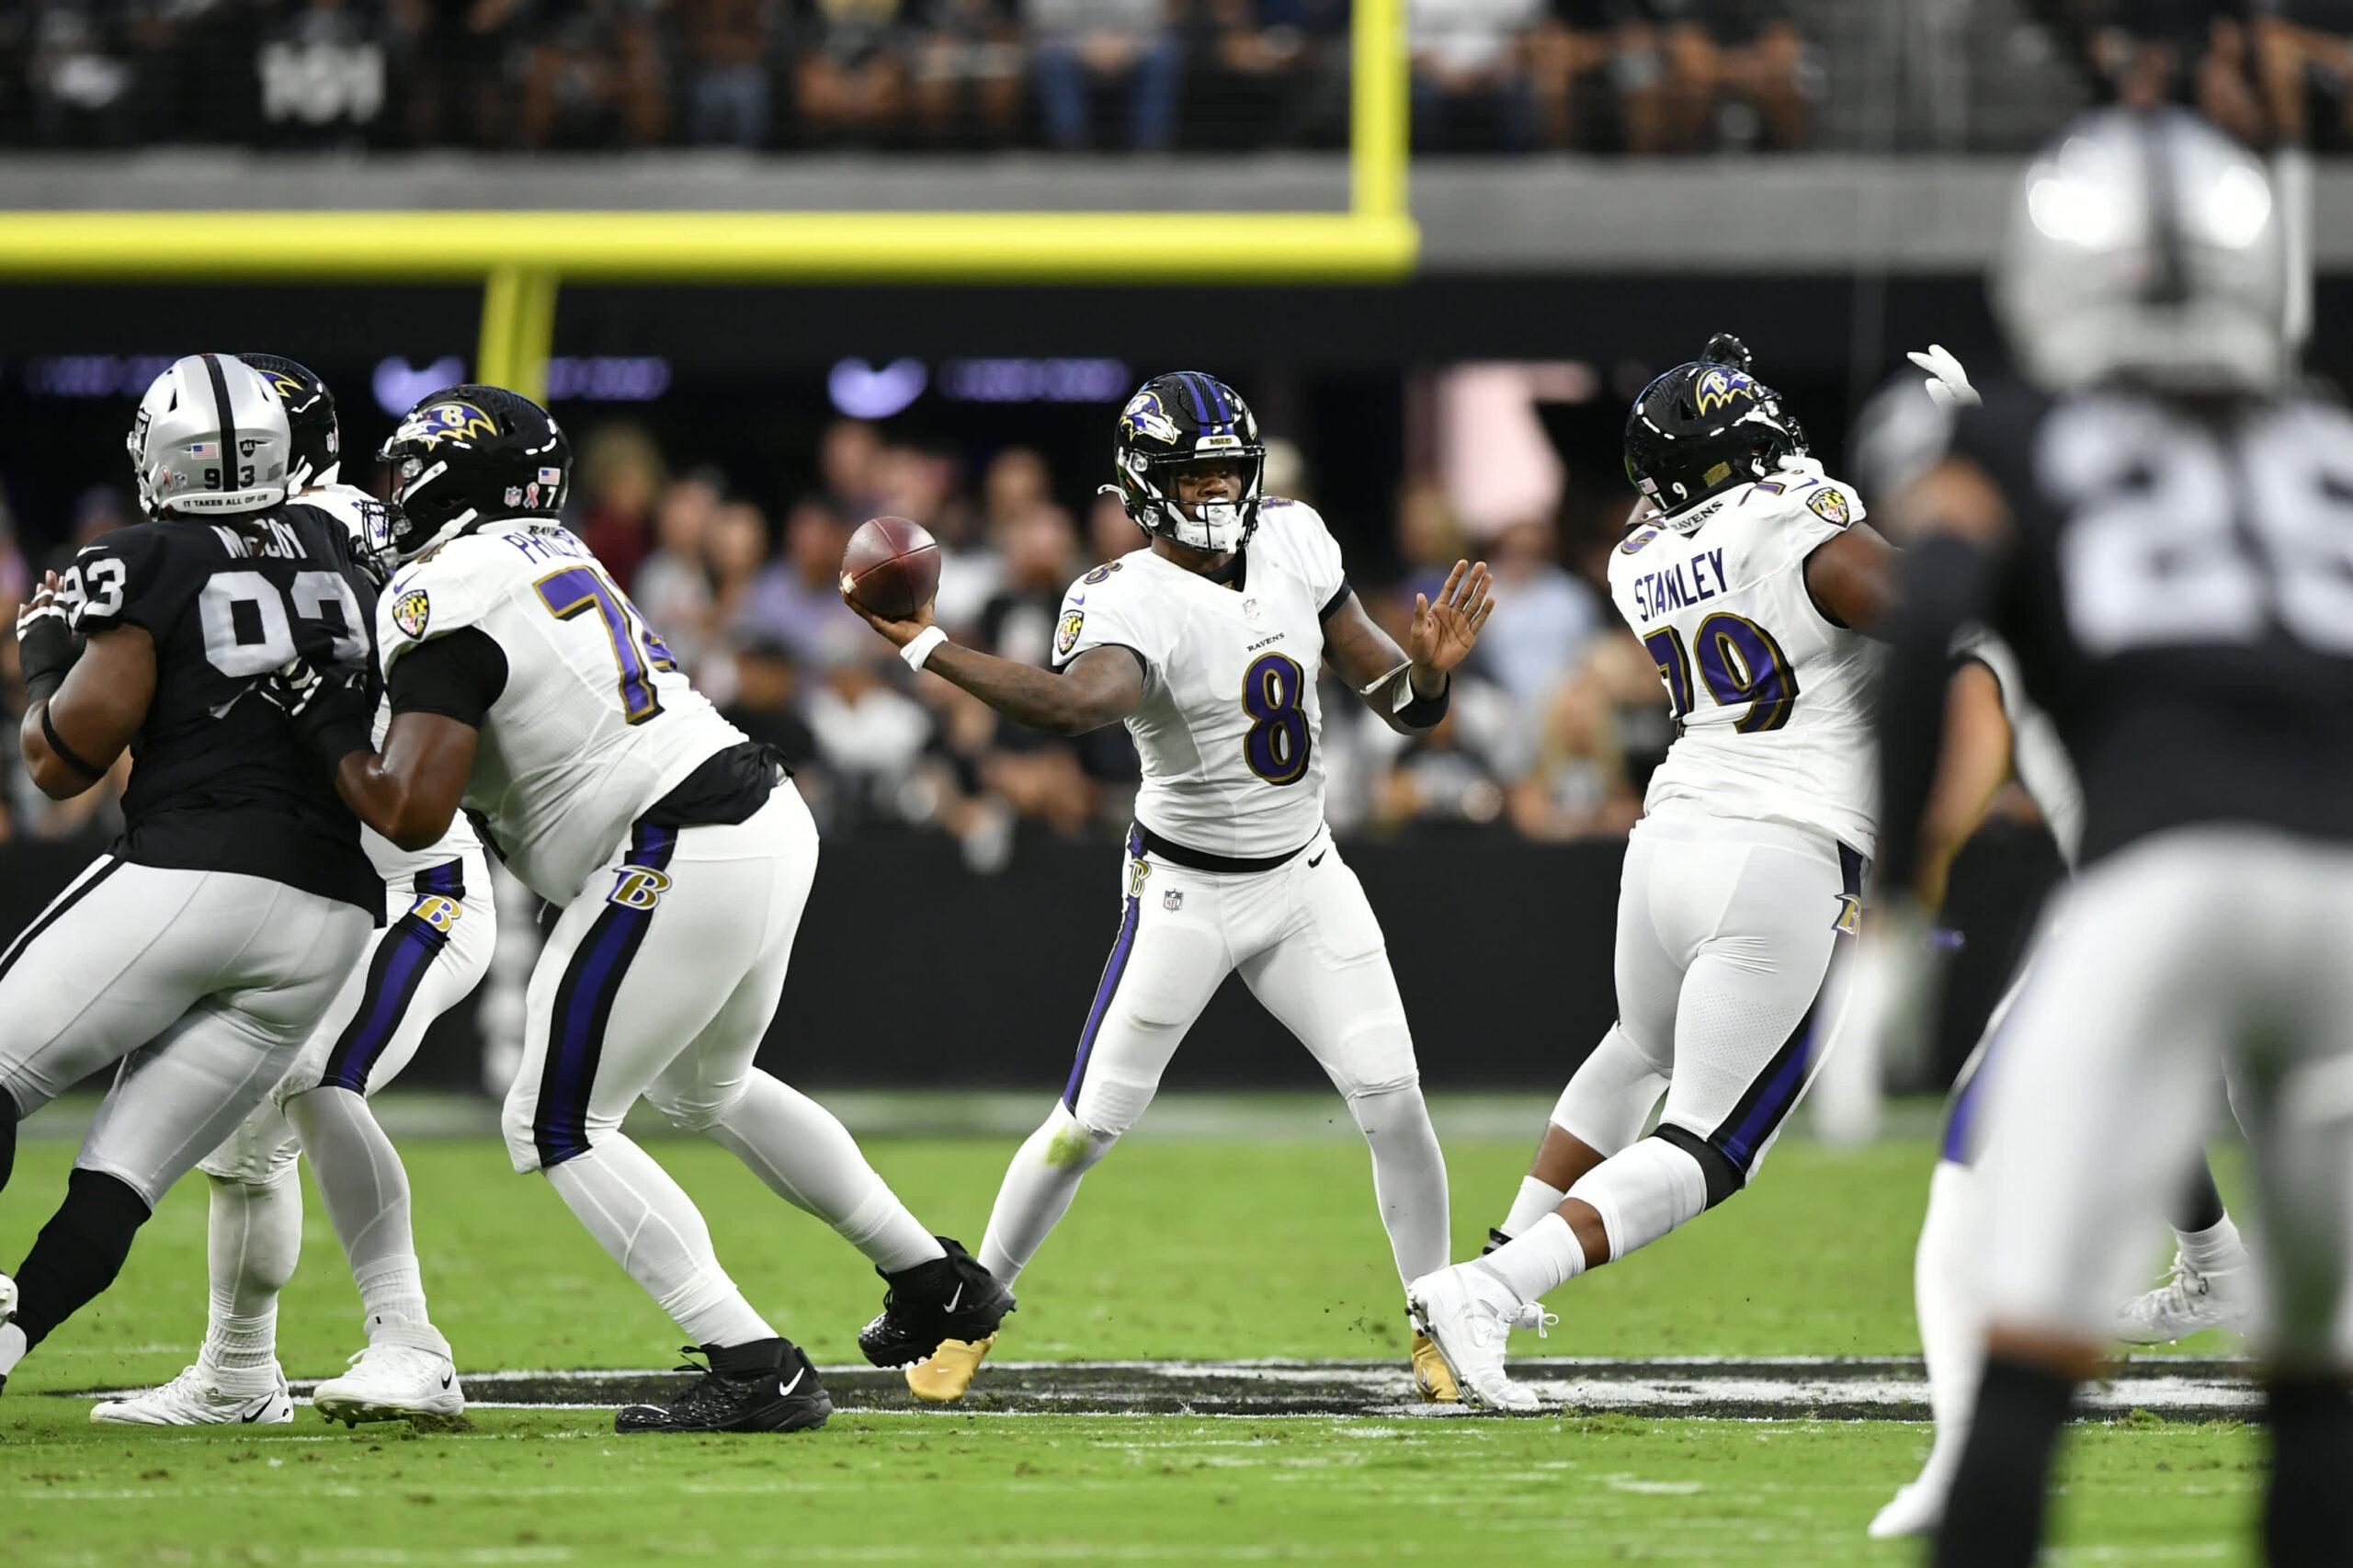 ESPN Monday Night Football Raiders-Ravens opener draws 15.3 million